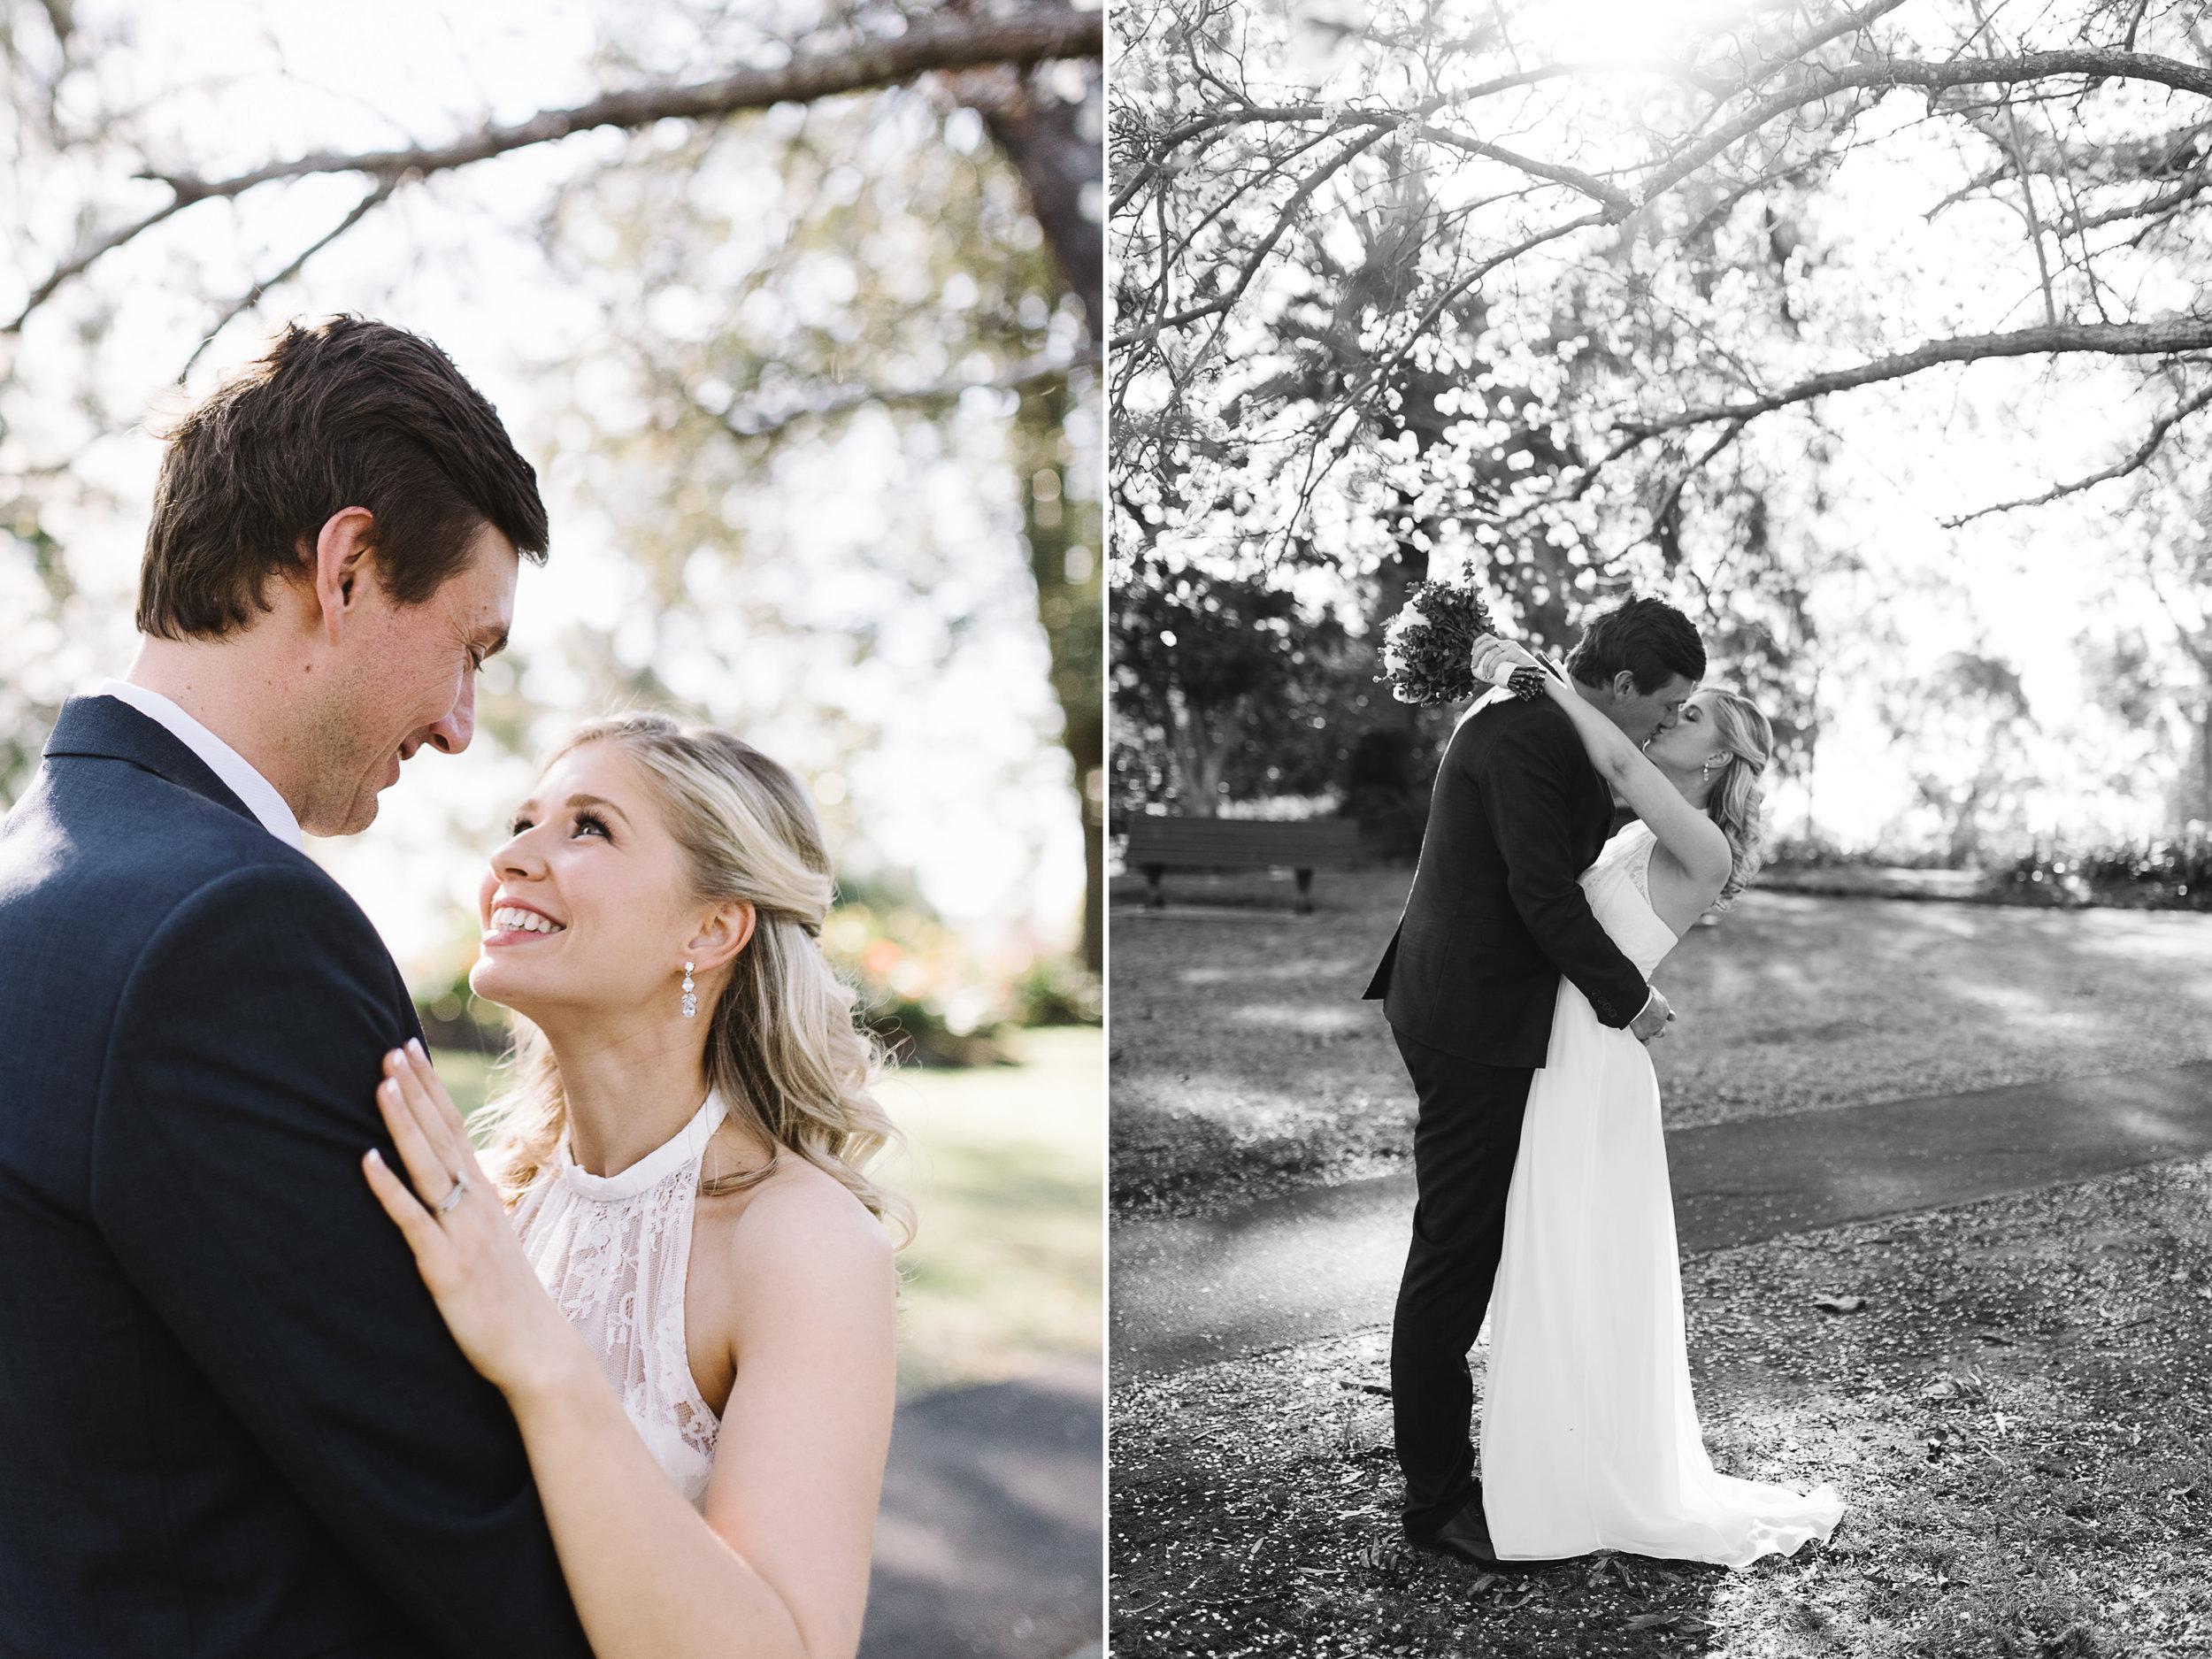 sydney-wedding-photographer-1.jpg